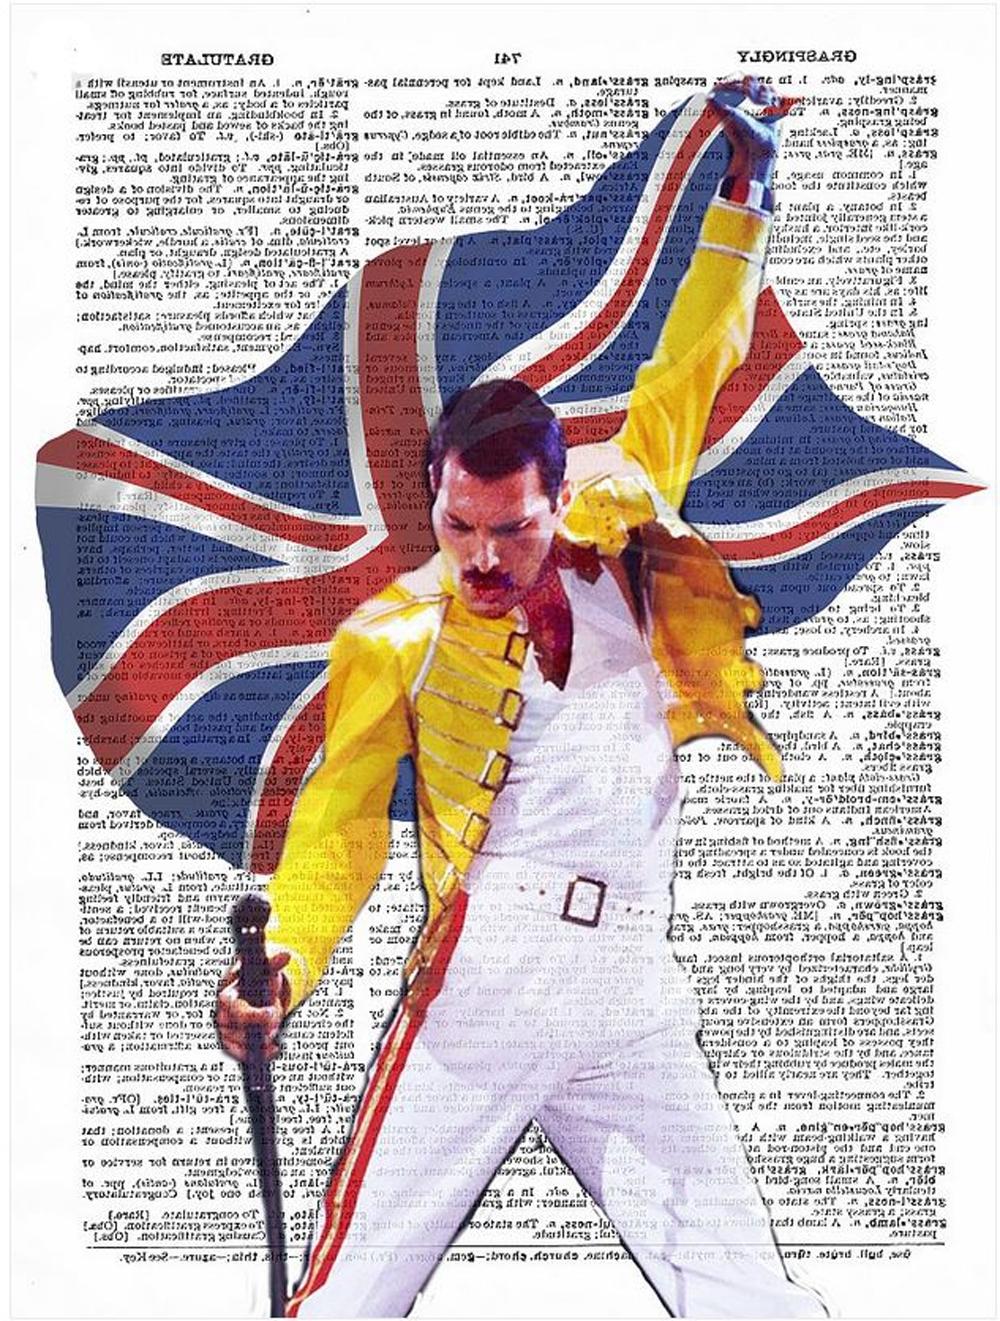 Art N Wordz Queen's Freddie Mercury Original Dictionary Sheet Pop Regarding Latest Freddie Mercury Wall Art (View 2 of 15)